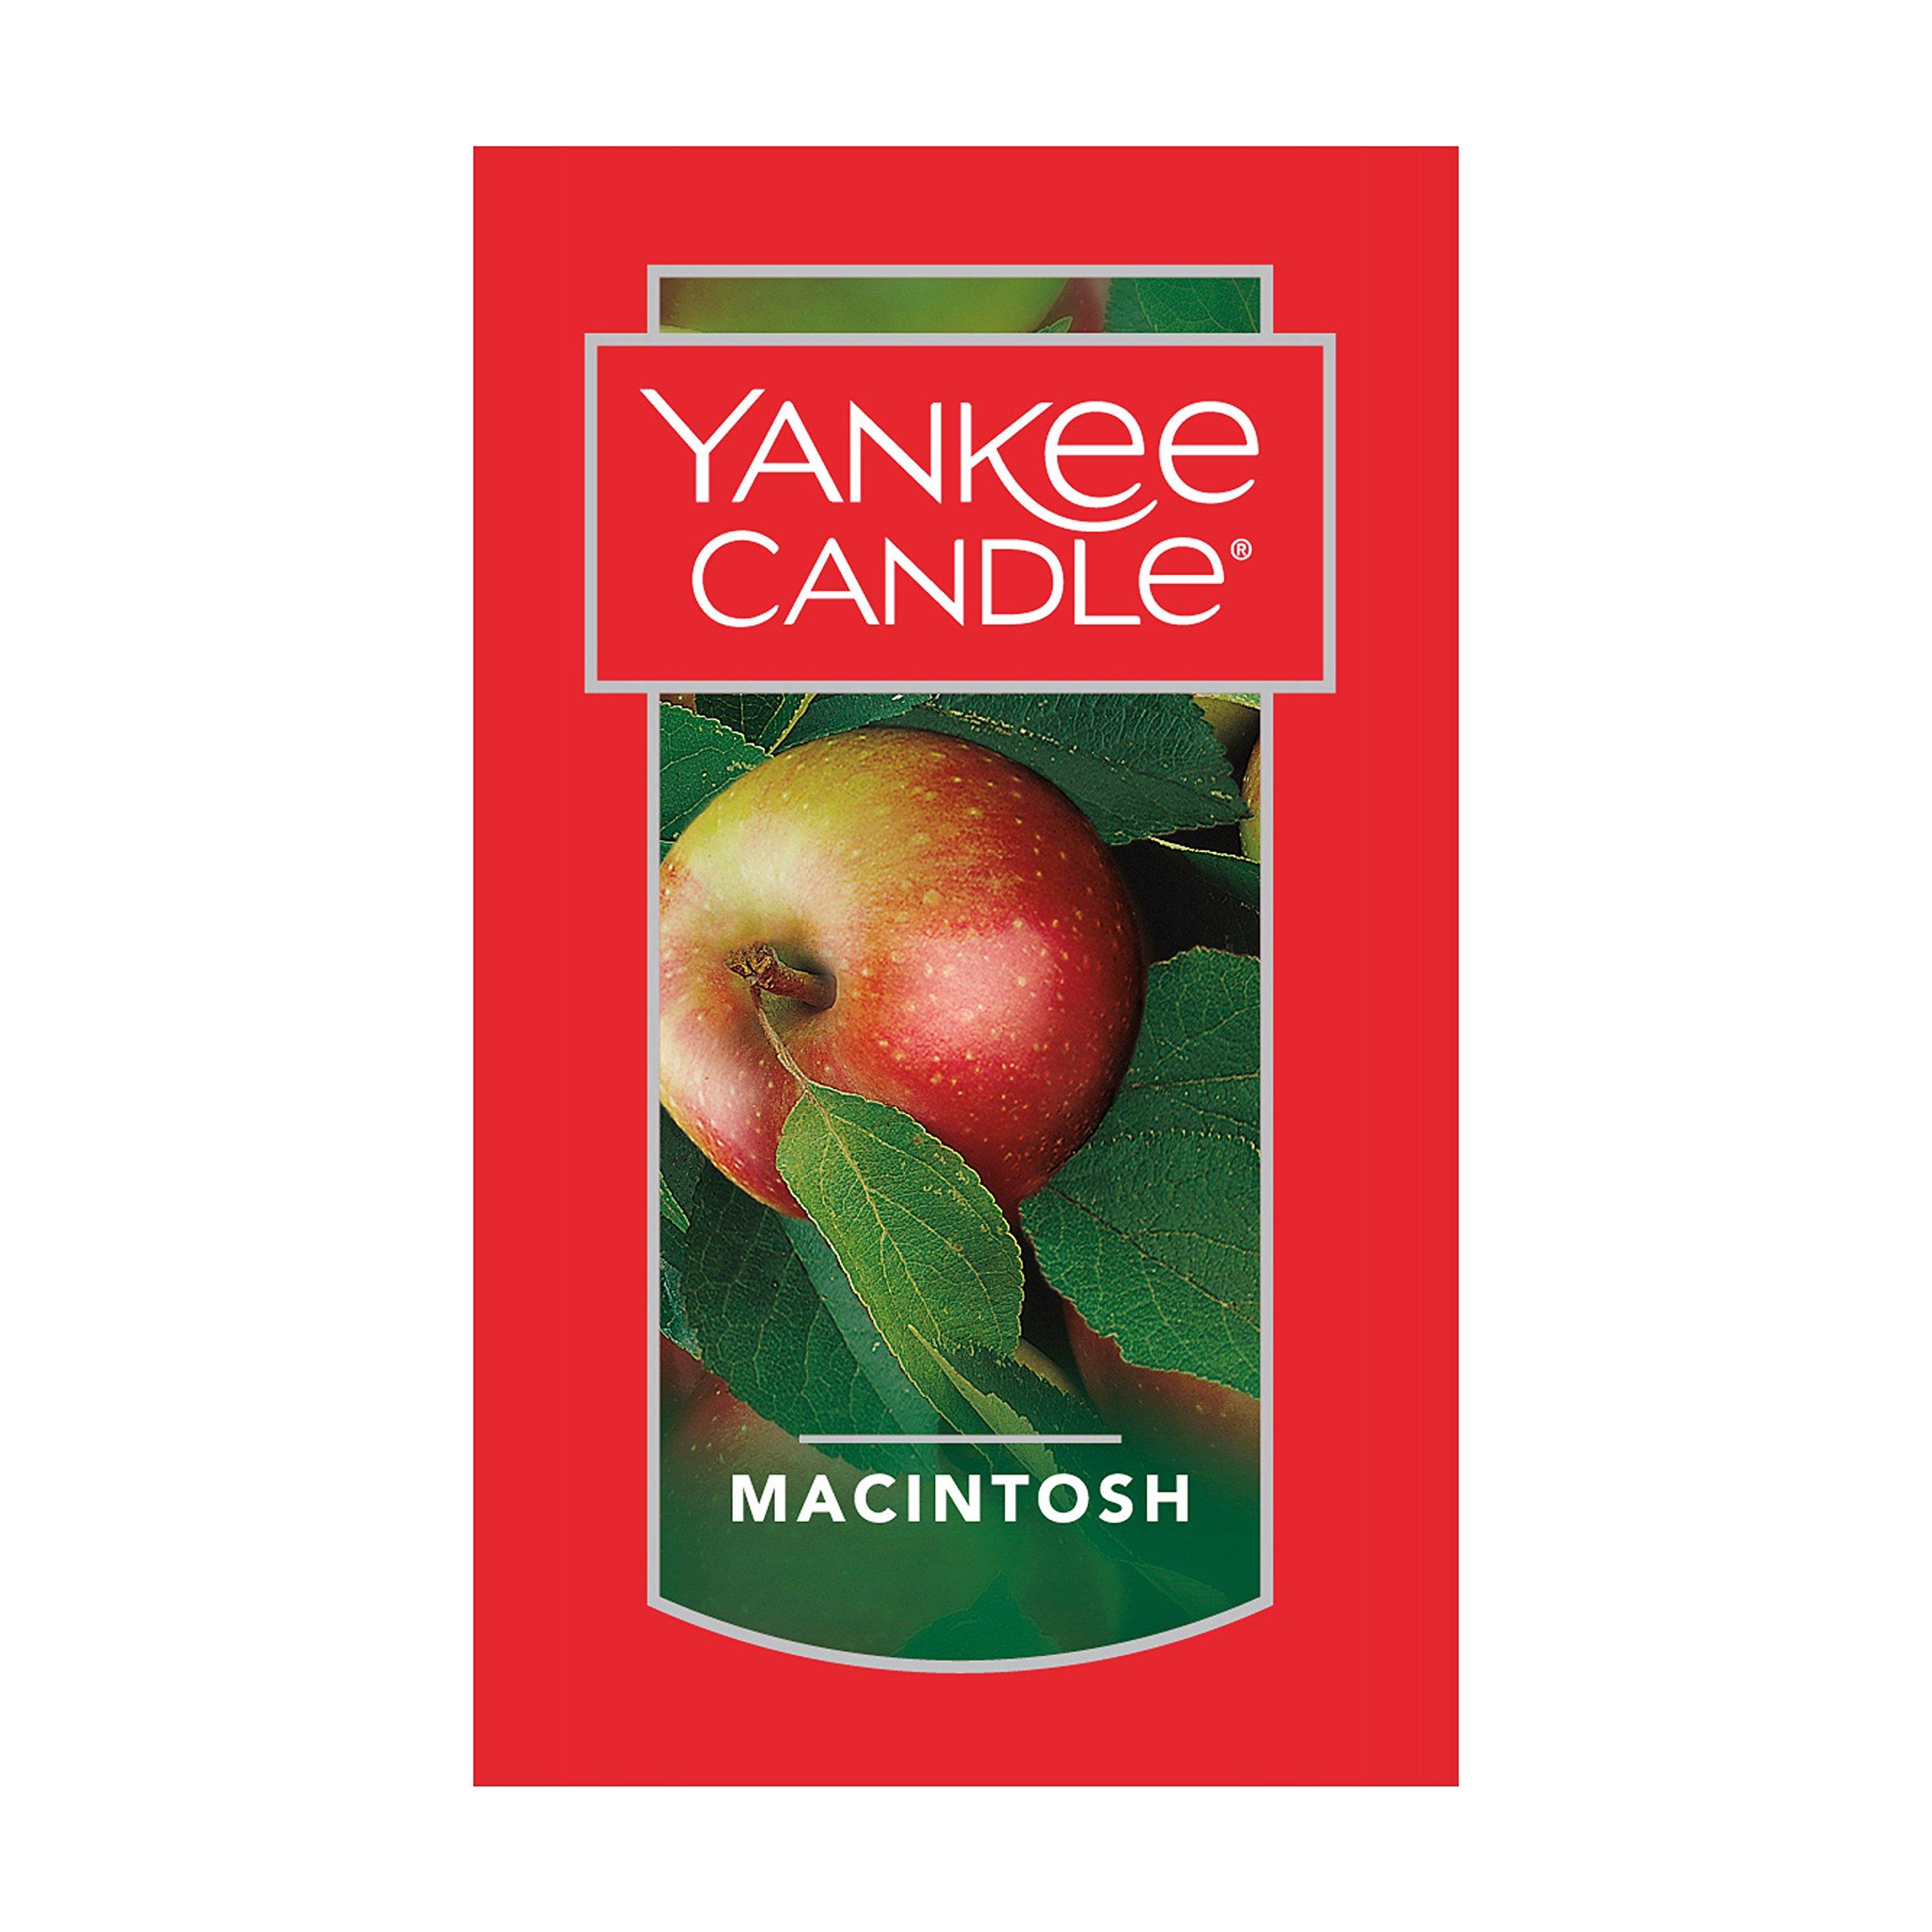 Yankee Candle Large Jar Candle, Macintosh by Yankee Candle (Image #2)